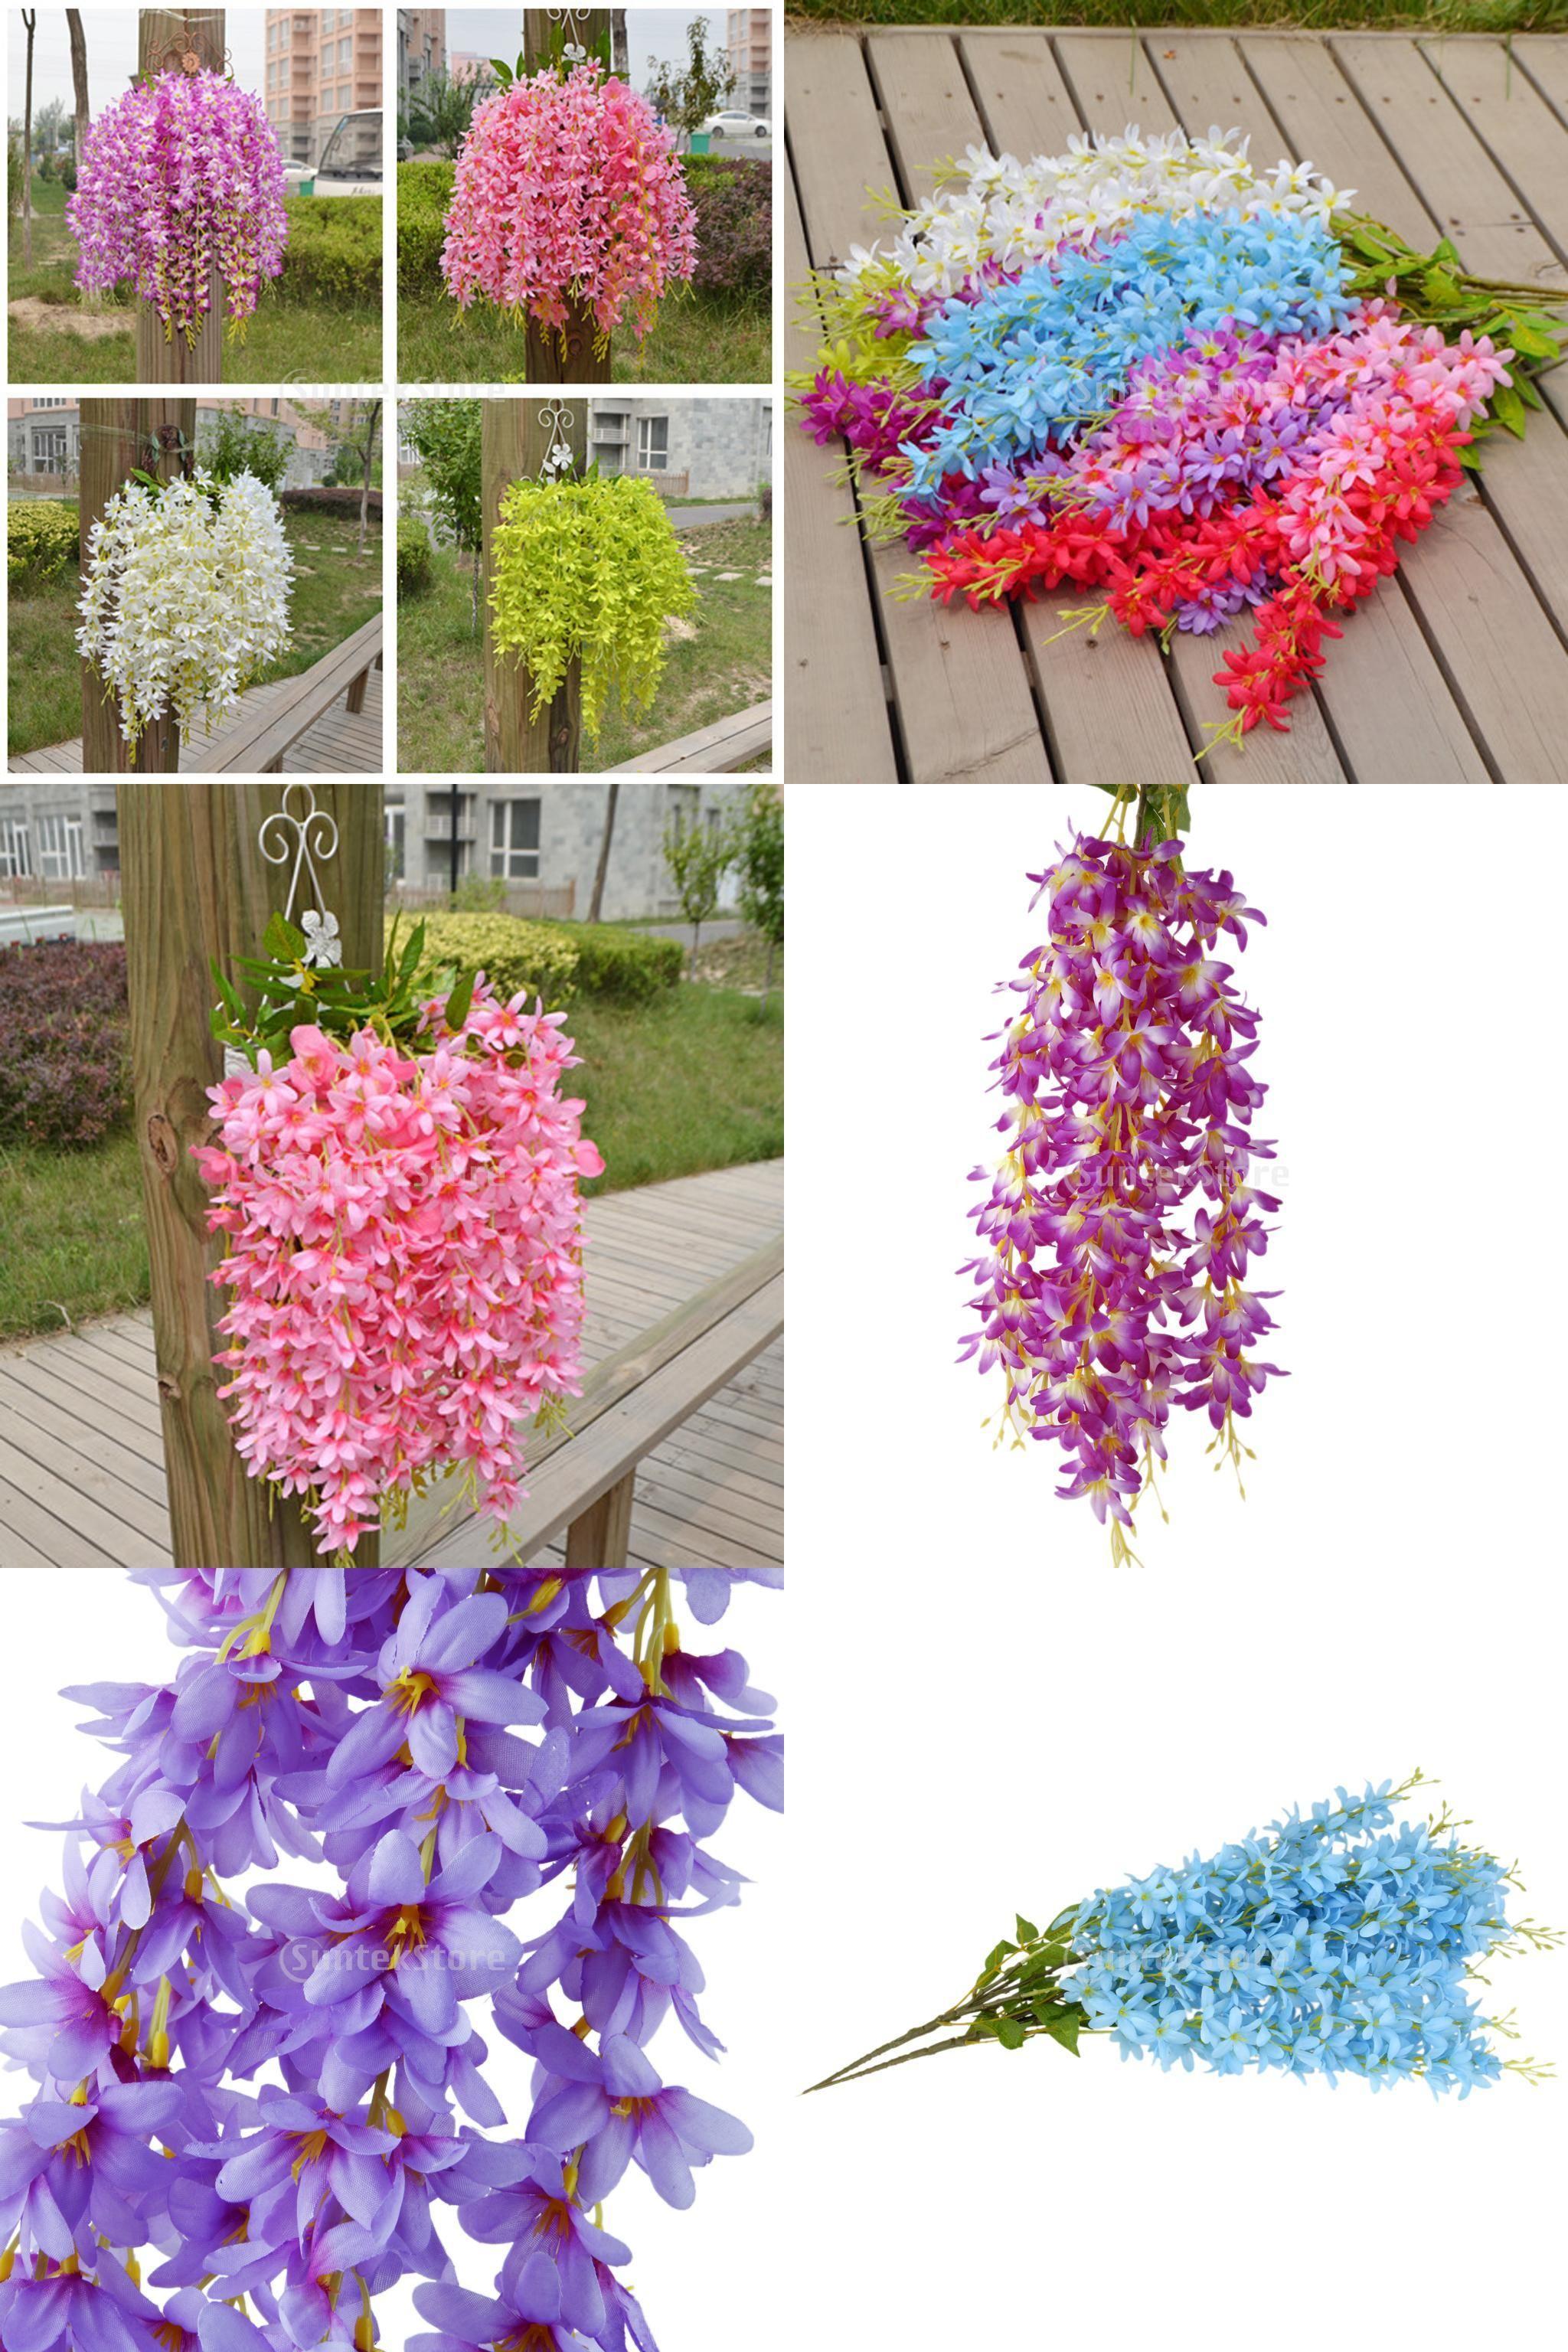 Visit To Buy 2pcs Bunch Silk Hanging Plants Artificial Lilac Flower Garland Decor Garden Diy Decor 6 Colors Ad Hanging Plants Garland Decor Diy Garden Decor